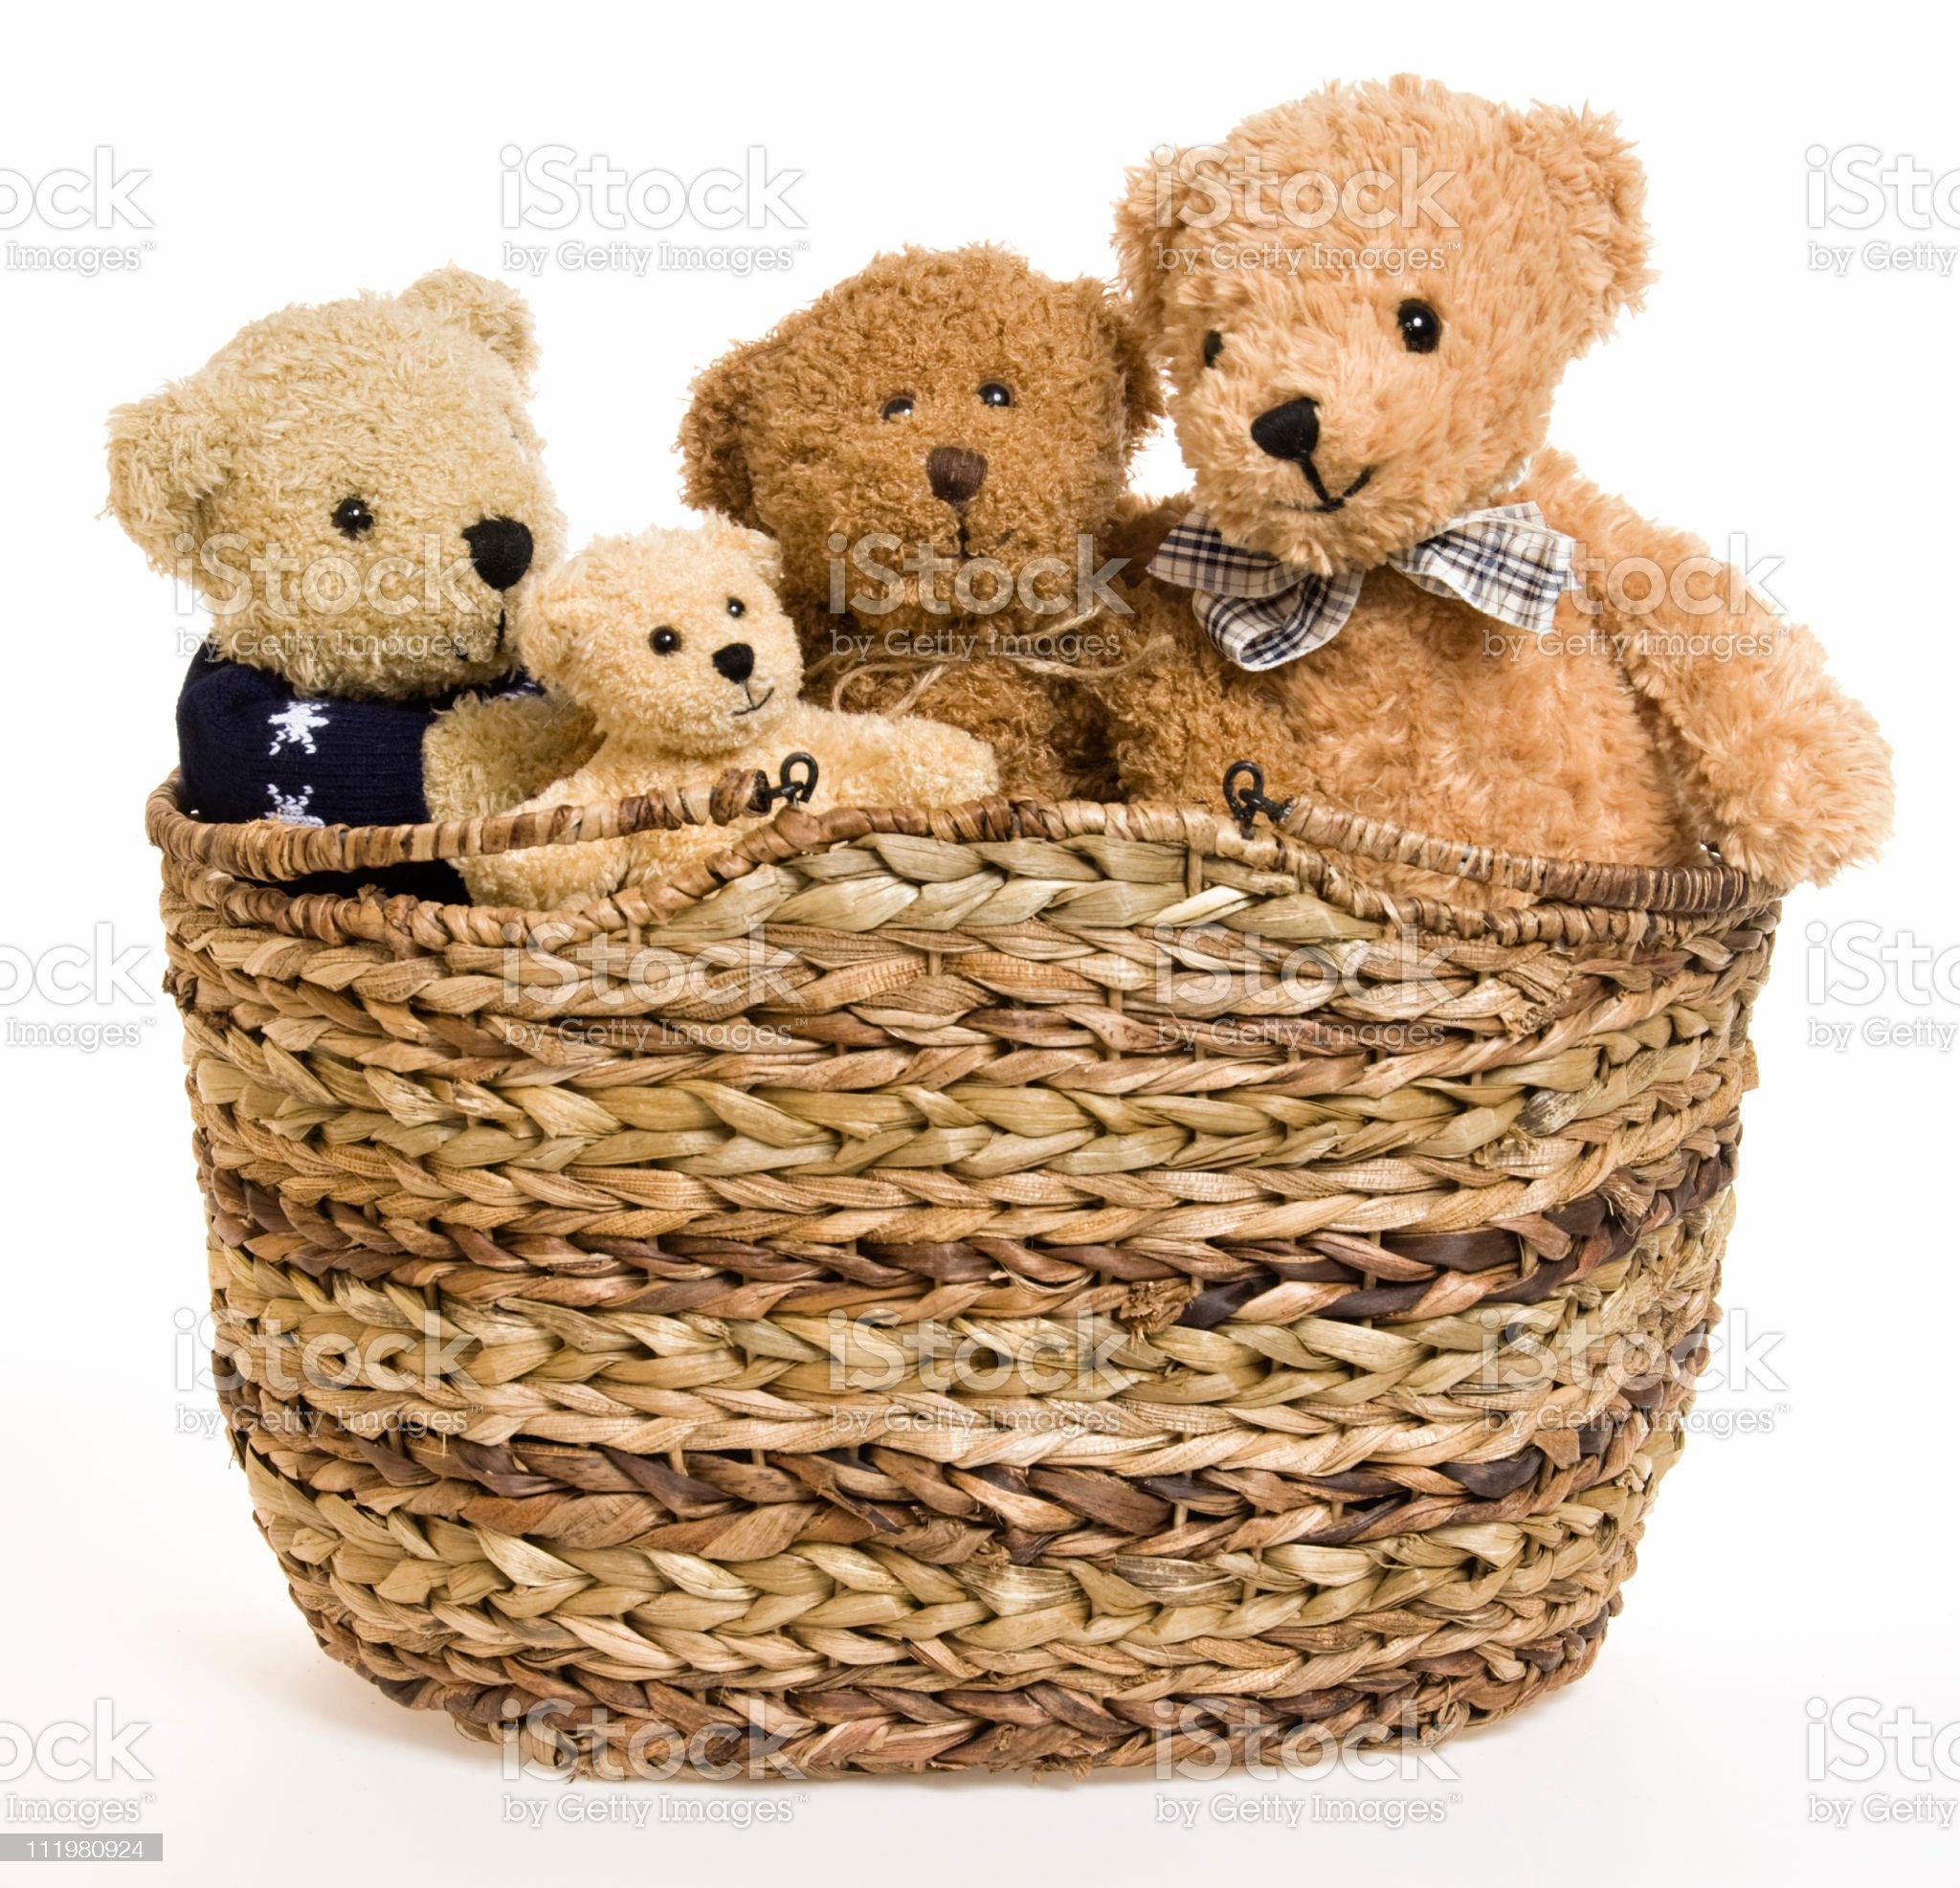 Teddy Bear Family in Picnic Basket royalty-free stock photo